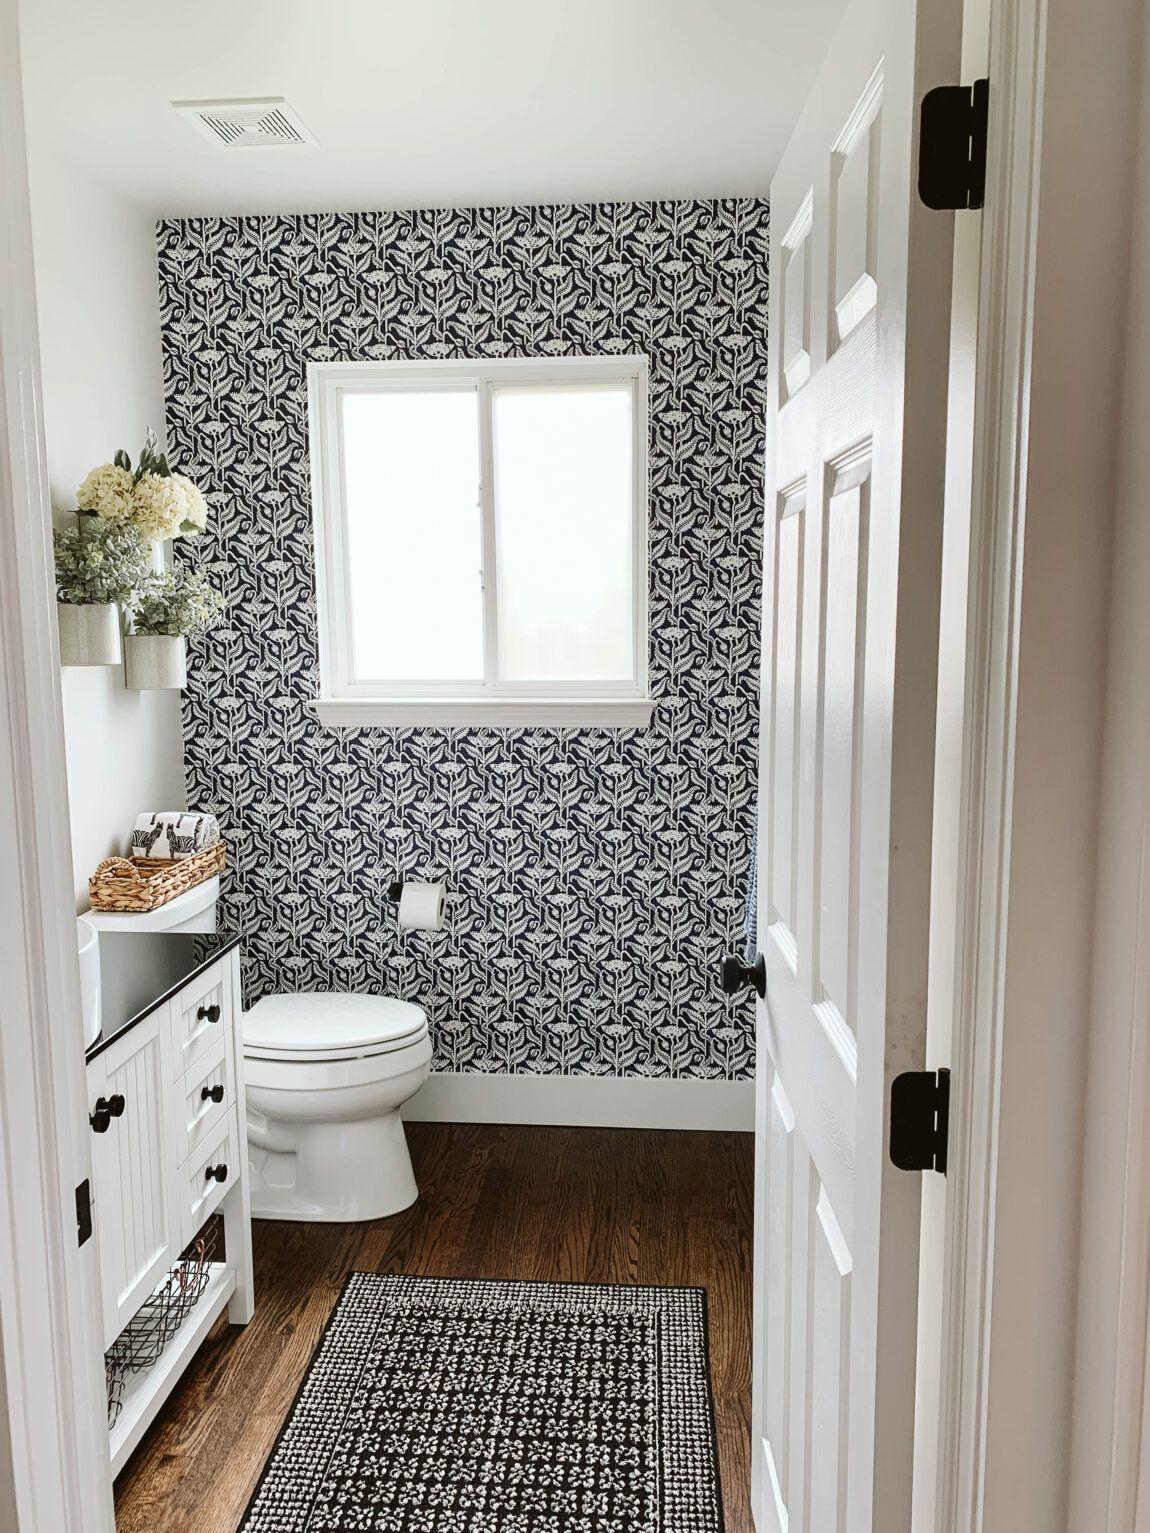 Modern Farmhouse Renovation Clark Aldine In 2020 Wallpaper Accent Wall Bathroom Powder Room Wallpaper Modern Farmhouse Bathroom